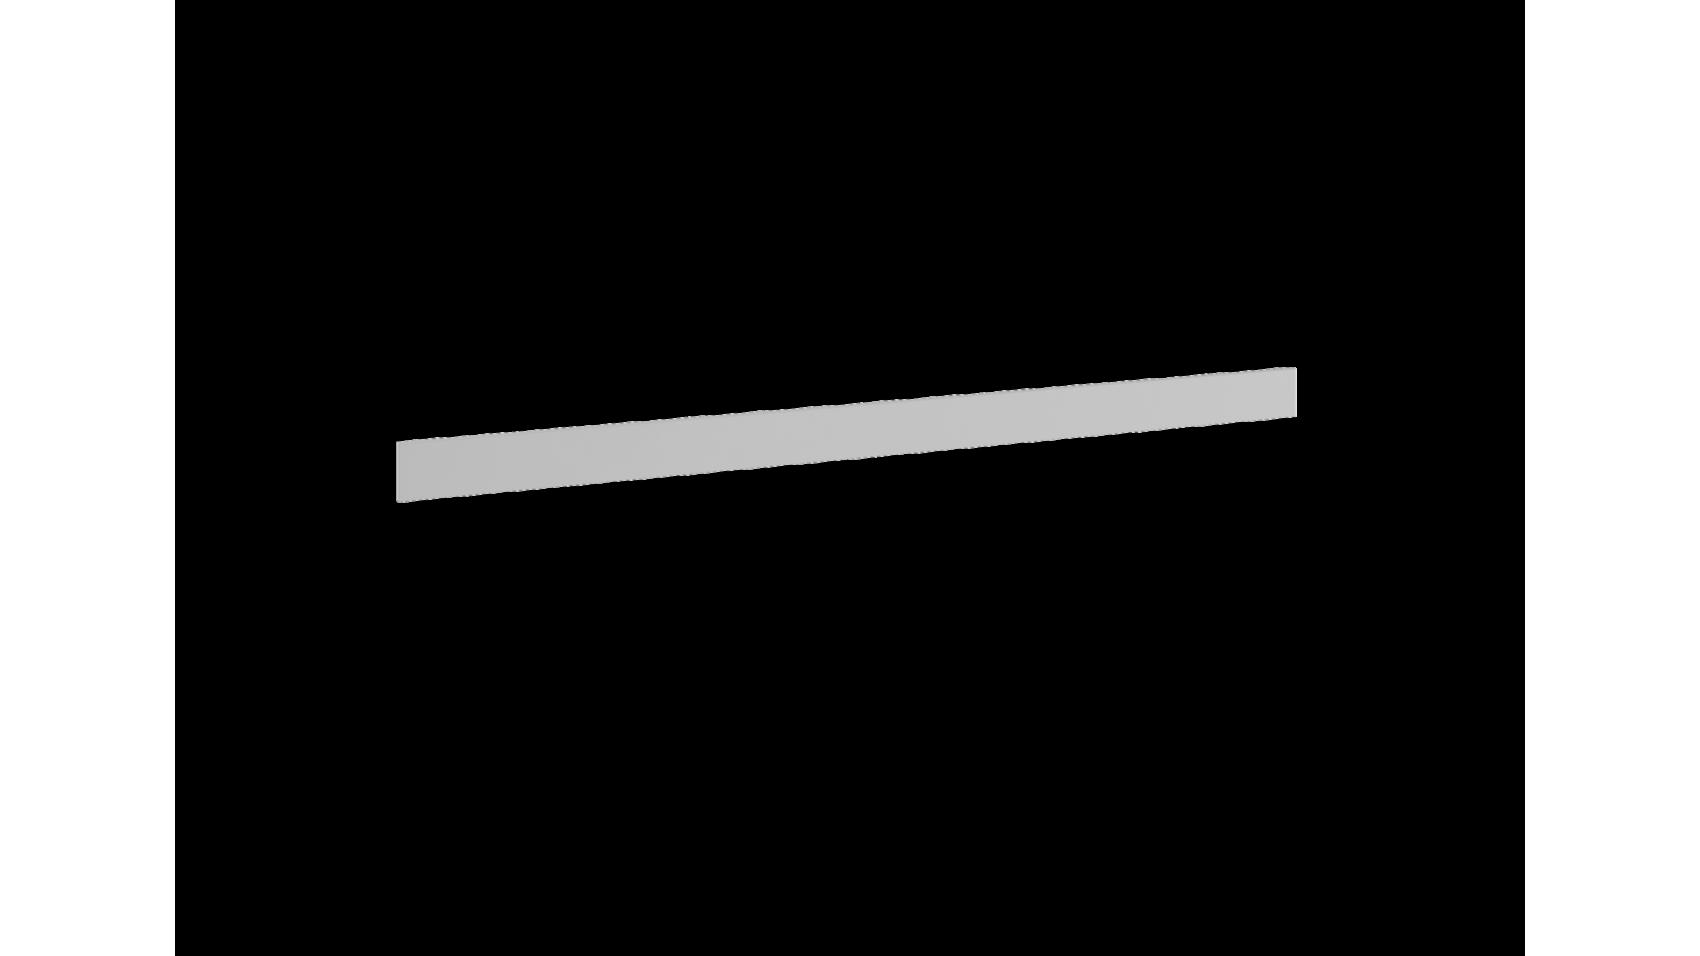 Kuchenne Elementy Dodatkowe Bella Nube | sklep internetowy Lupus ECO